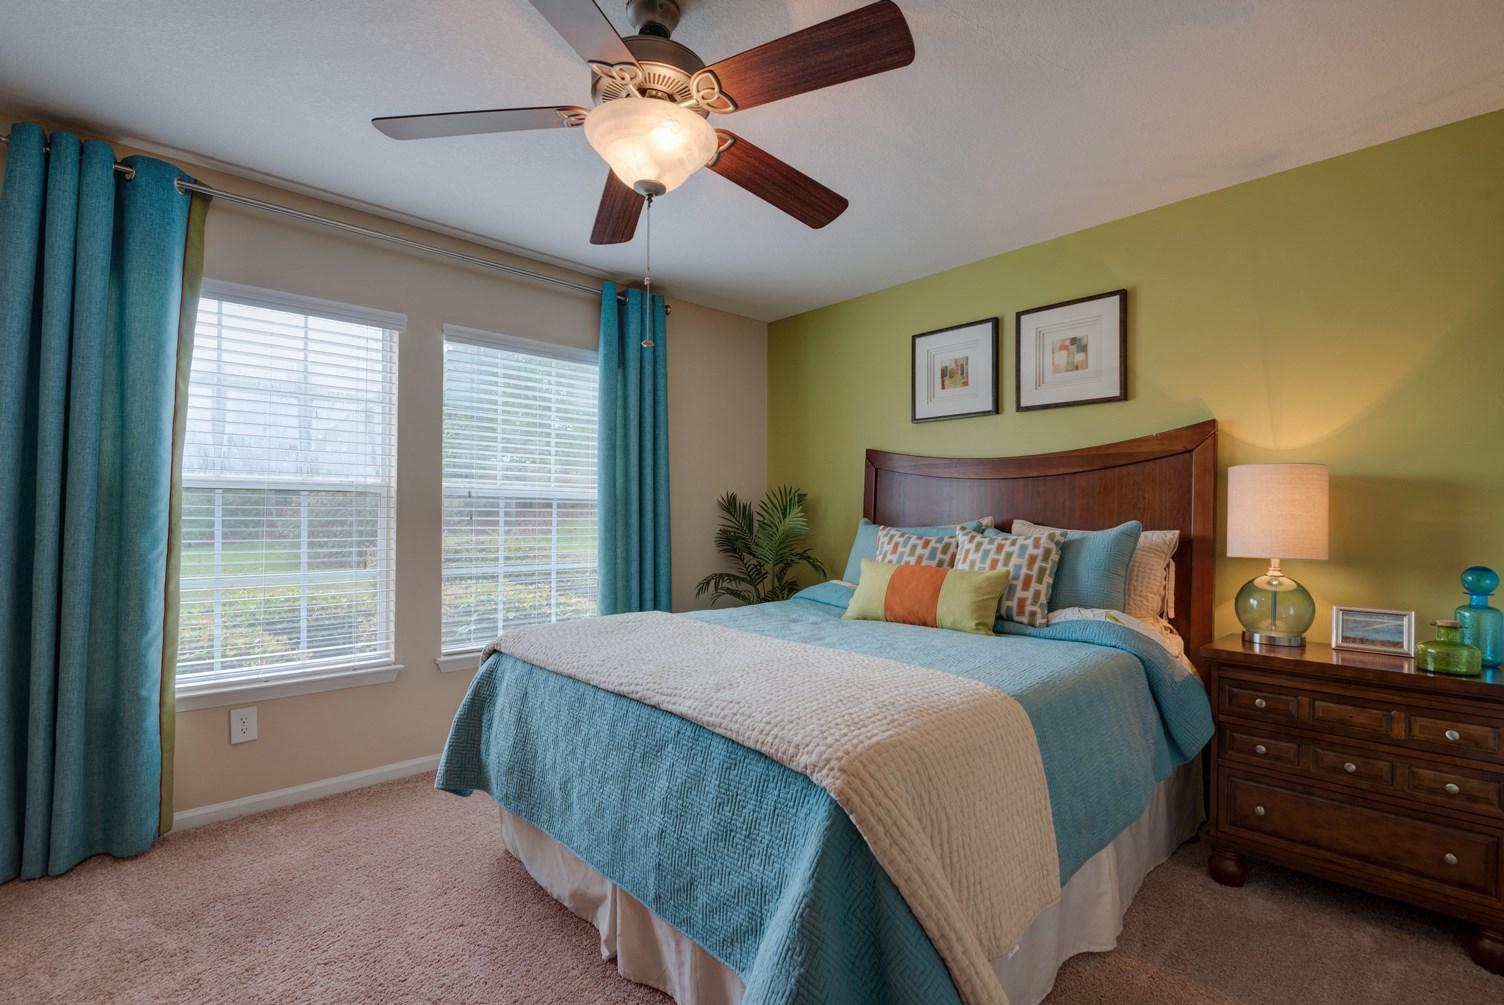 Bedroom at 150 Summit Apartments in Birmingham, AL